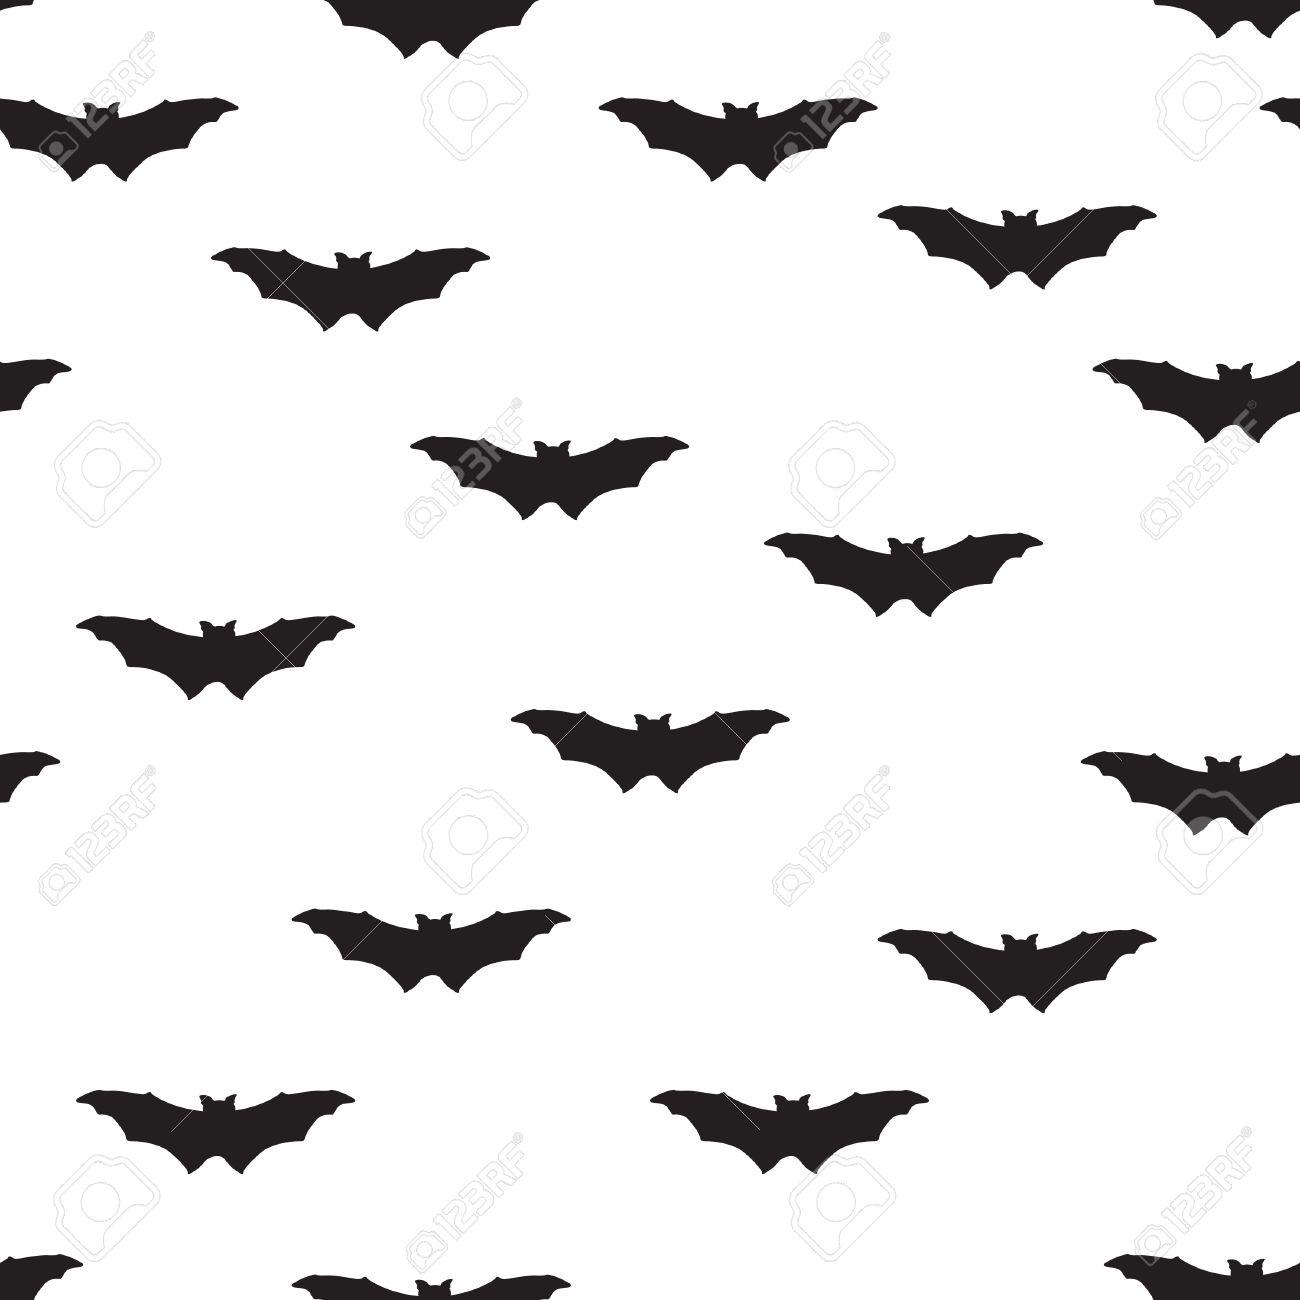 Bat silhouette seamless pattern. Holiday Halloween background. Halloween bat texture - 54857240